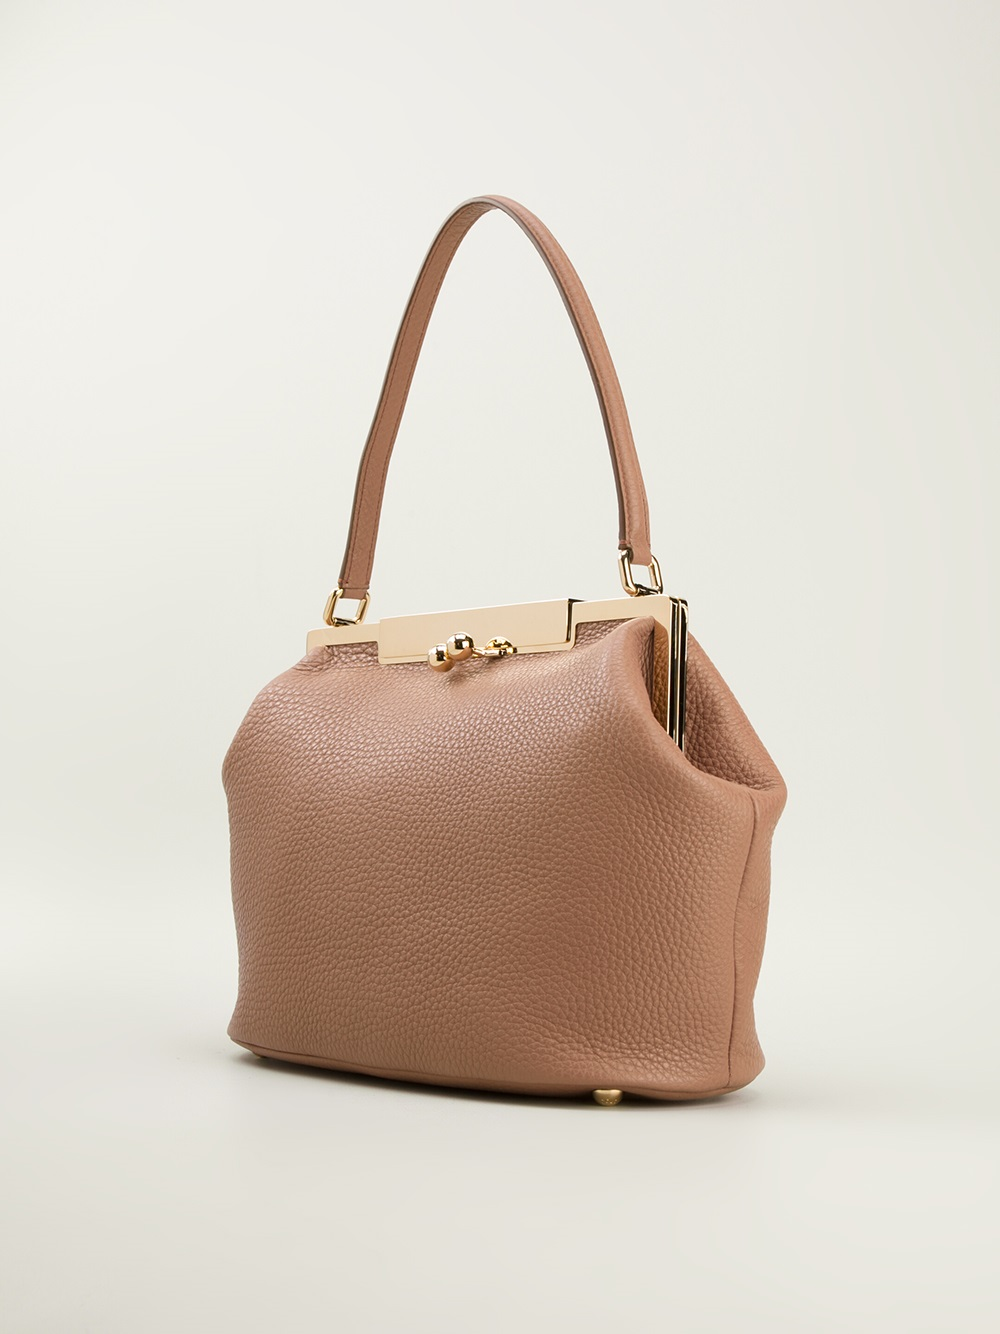 Dolce & Gabbana 'sarah' Shoulder Bag - Biedermann En Vogue - Farfetch.com